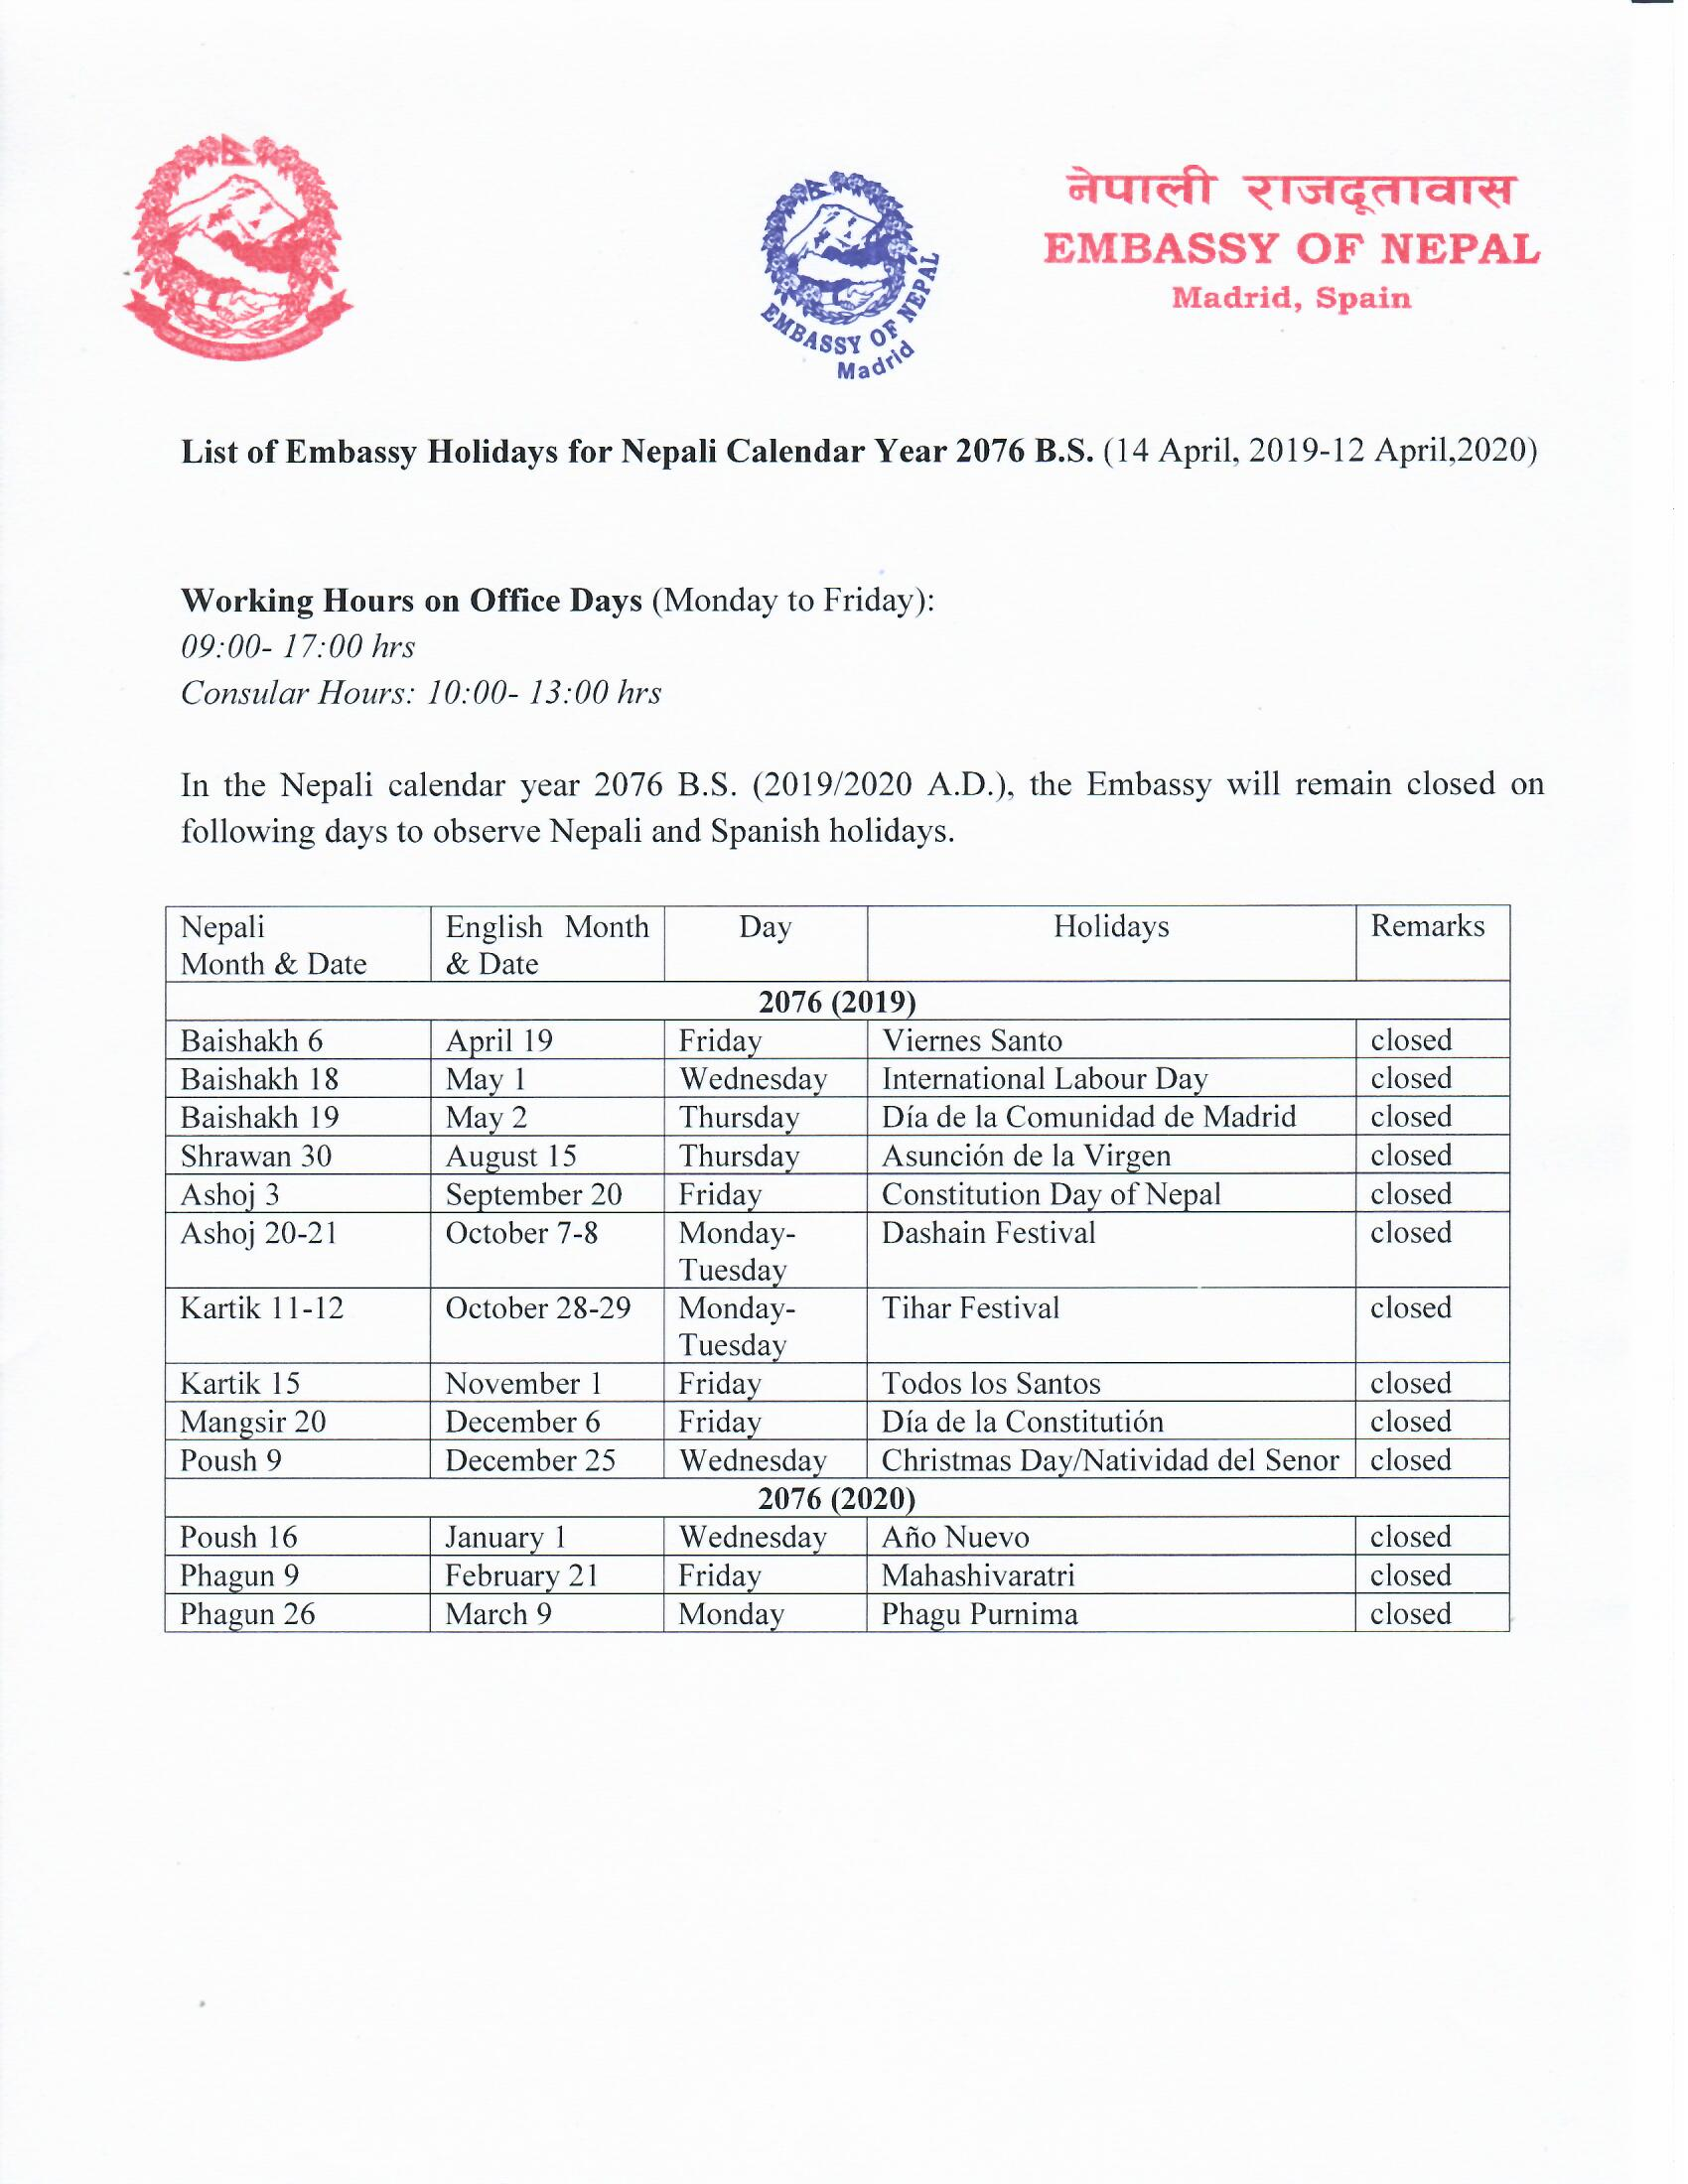 Public holidays New - Embassy of Nepal, Spain